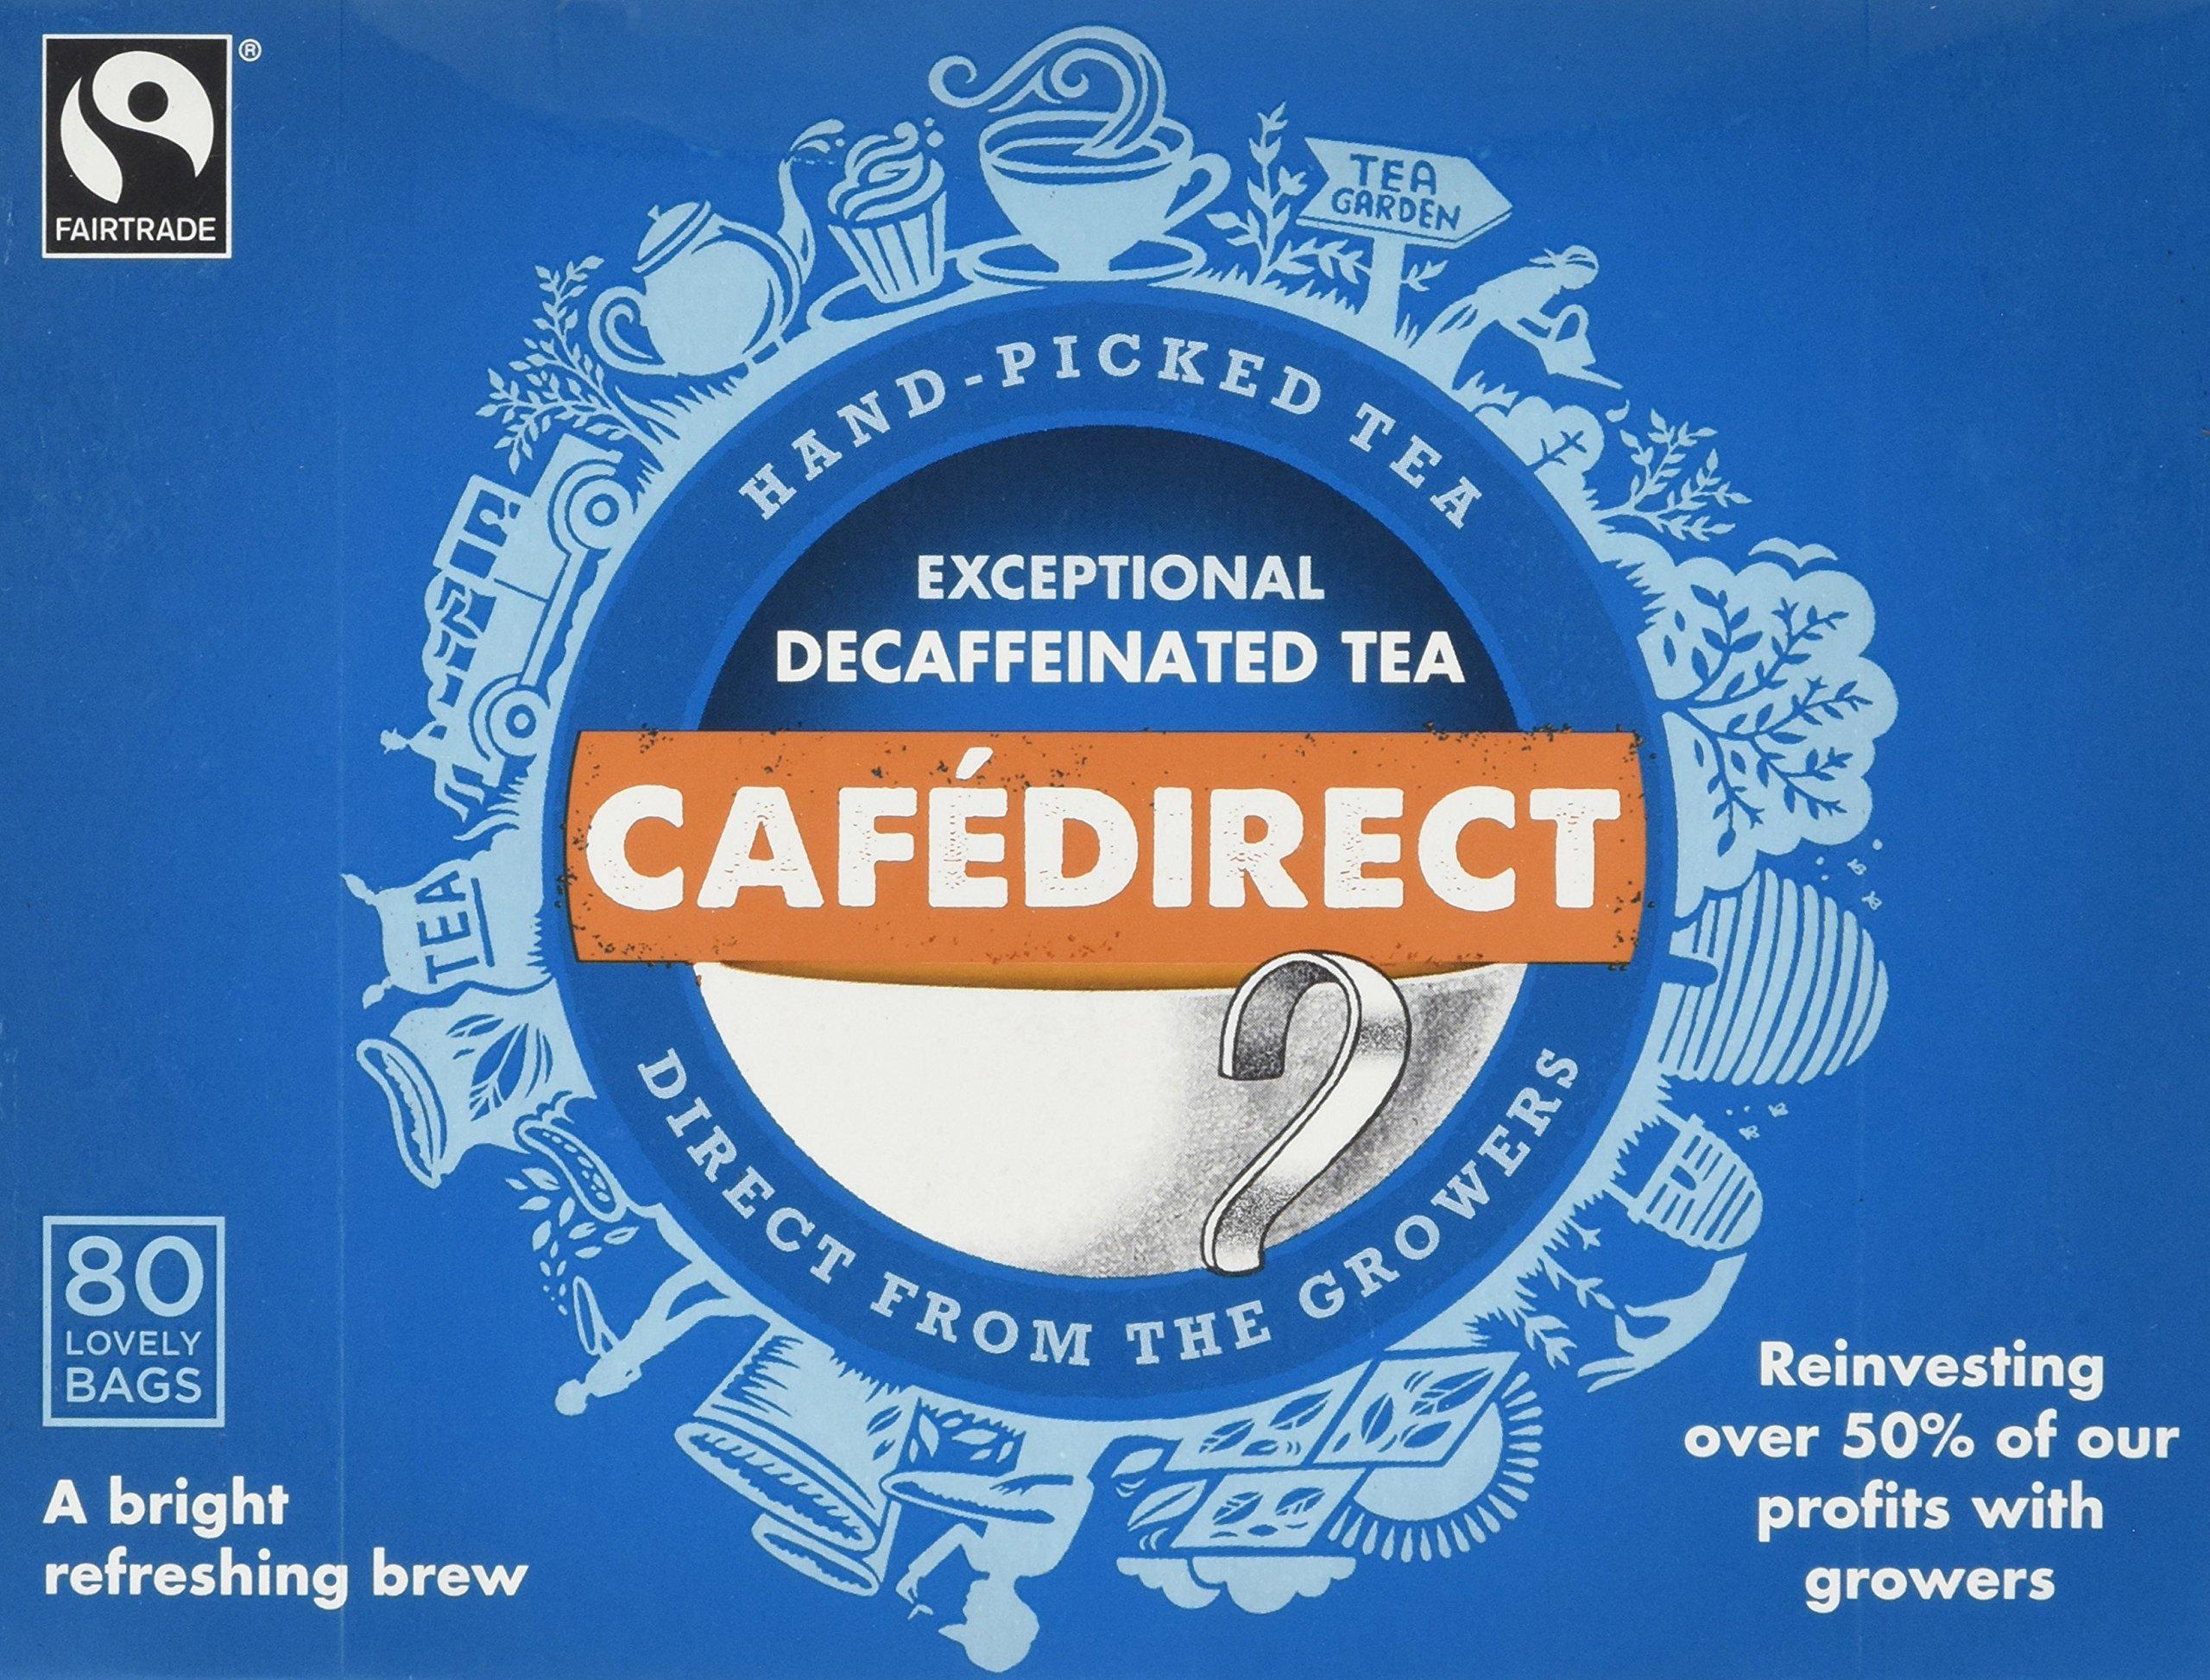 Cafédirect decaf tea bundle (fairtrade) (black tea) (6 packs of 80 bags) (480 bags) (brews in 2-4 minutes)